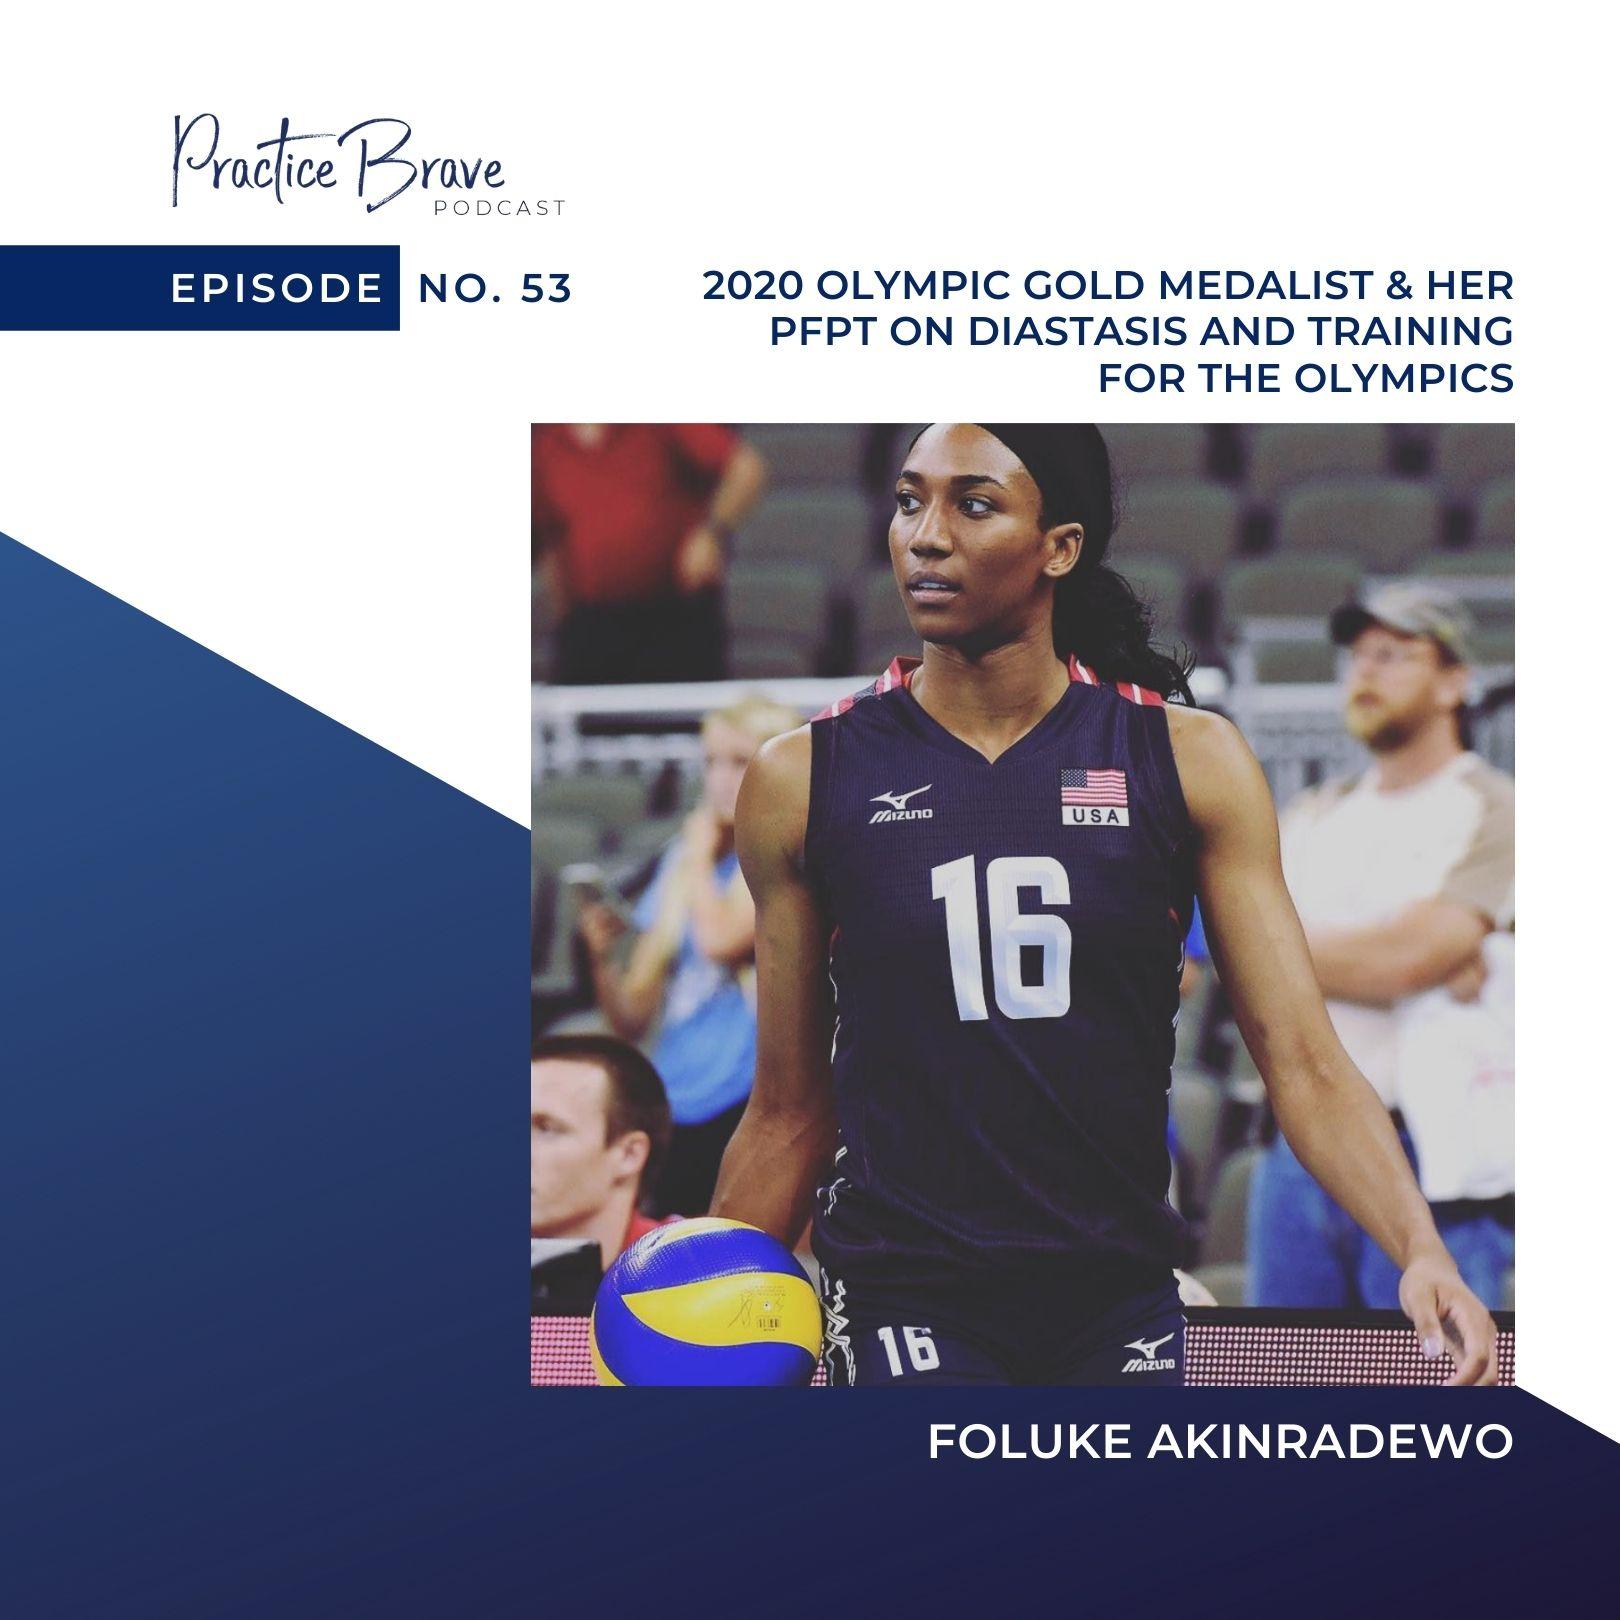 Episode 53: 2020 Olympic Gold Medalist Foluke Akinradewo & Her PFPT On Diastasis And Training For The Olympics